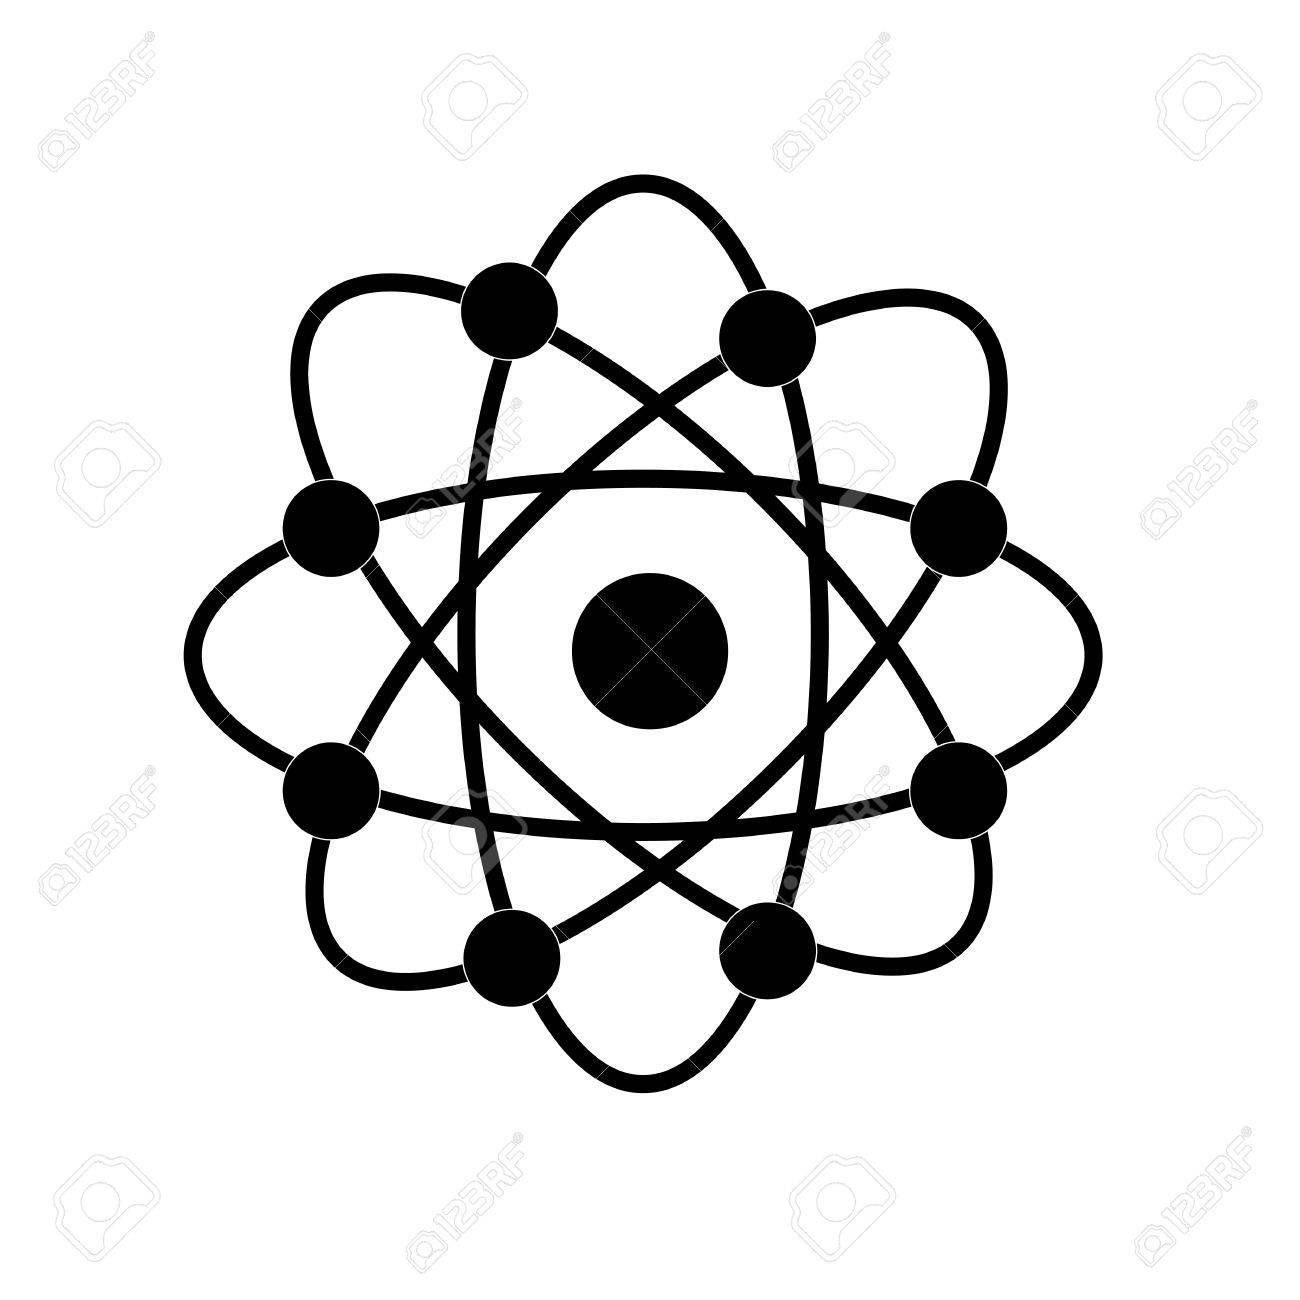 Atom structure vectorsymbol of atomatom atom illustration atom structure vectorsymbol of atomatom atom illustrationcovalent shell of ccuart Gallery